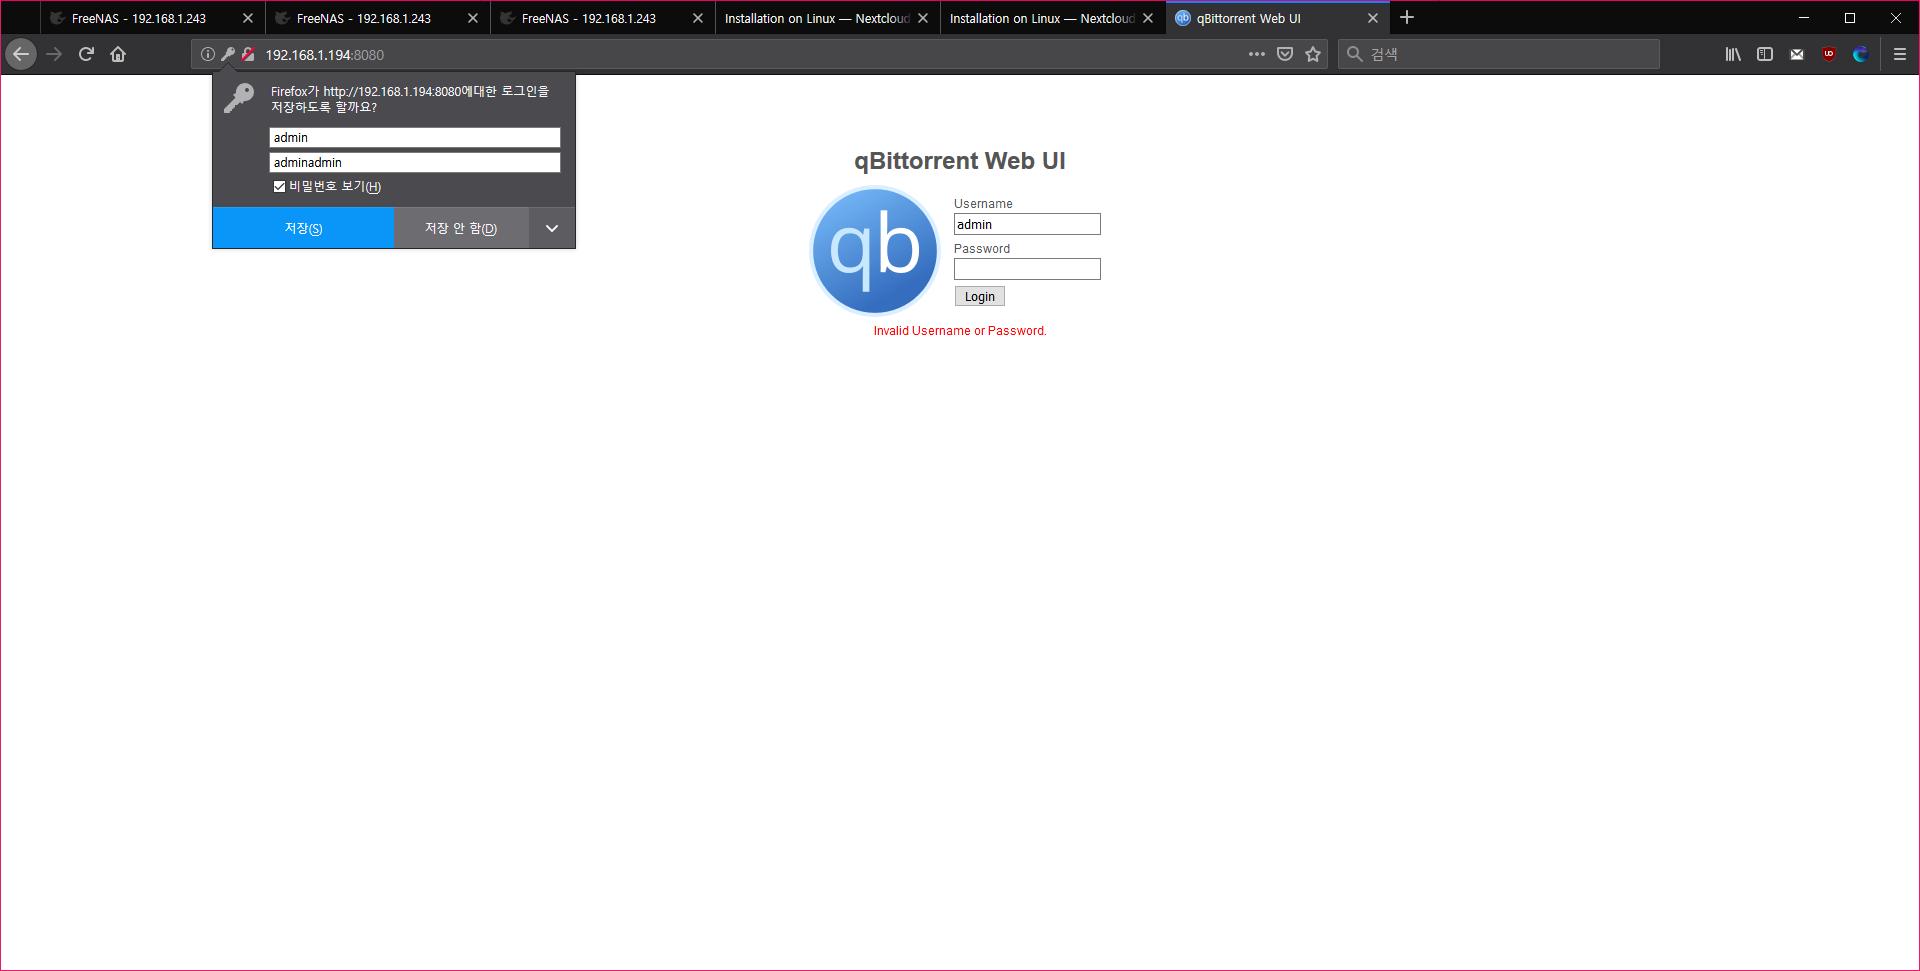 how to login qbittorrent webui? | iXsystems Community